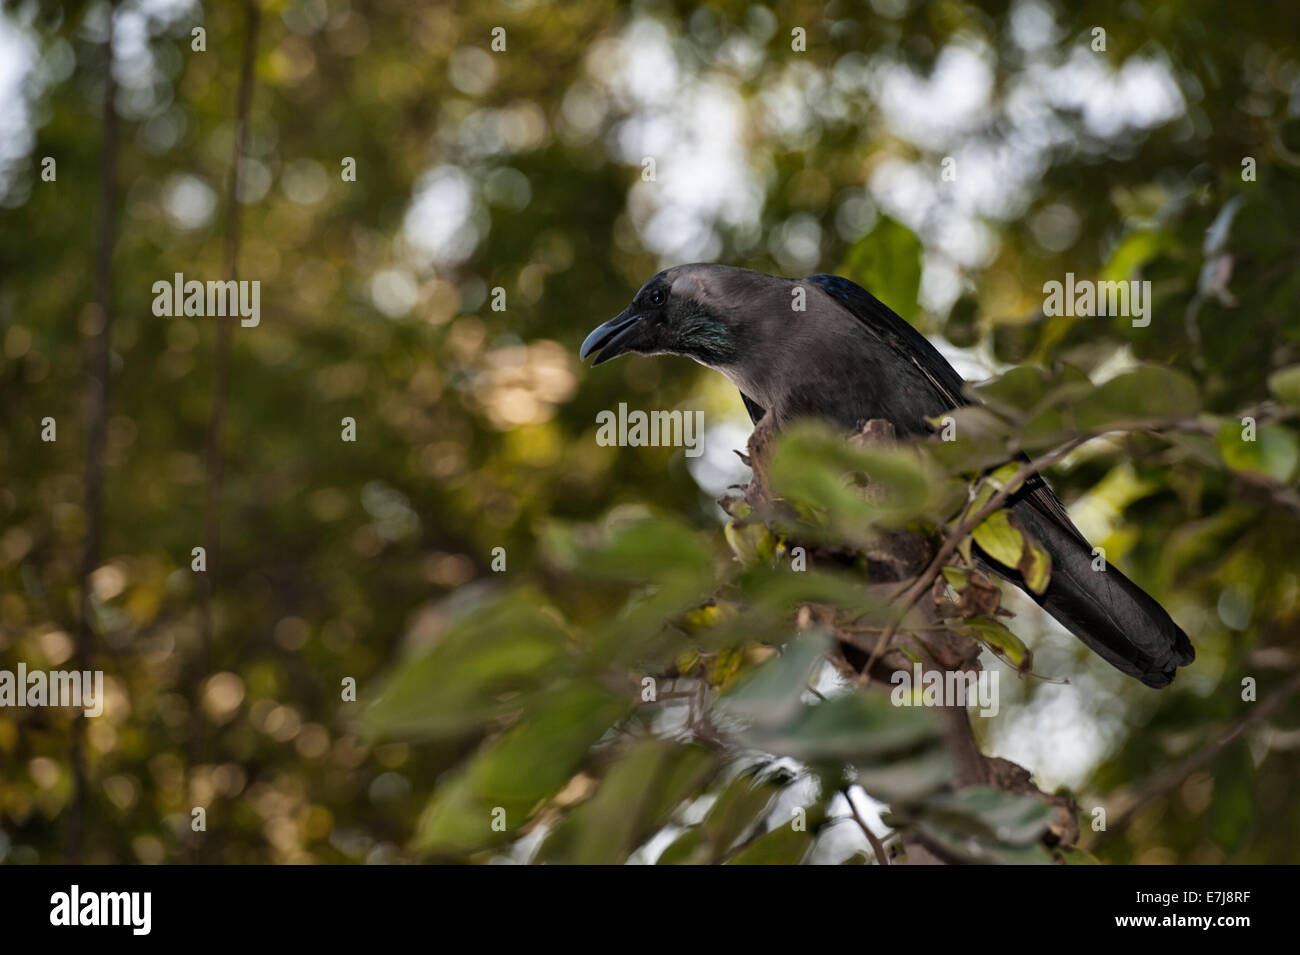 Haus-Krähe, Corvus Splendens, Rabenvögel, Allahabad, Indien Stockbild